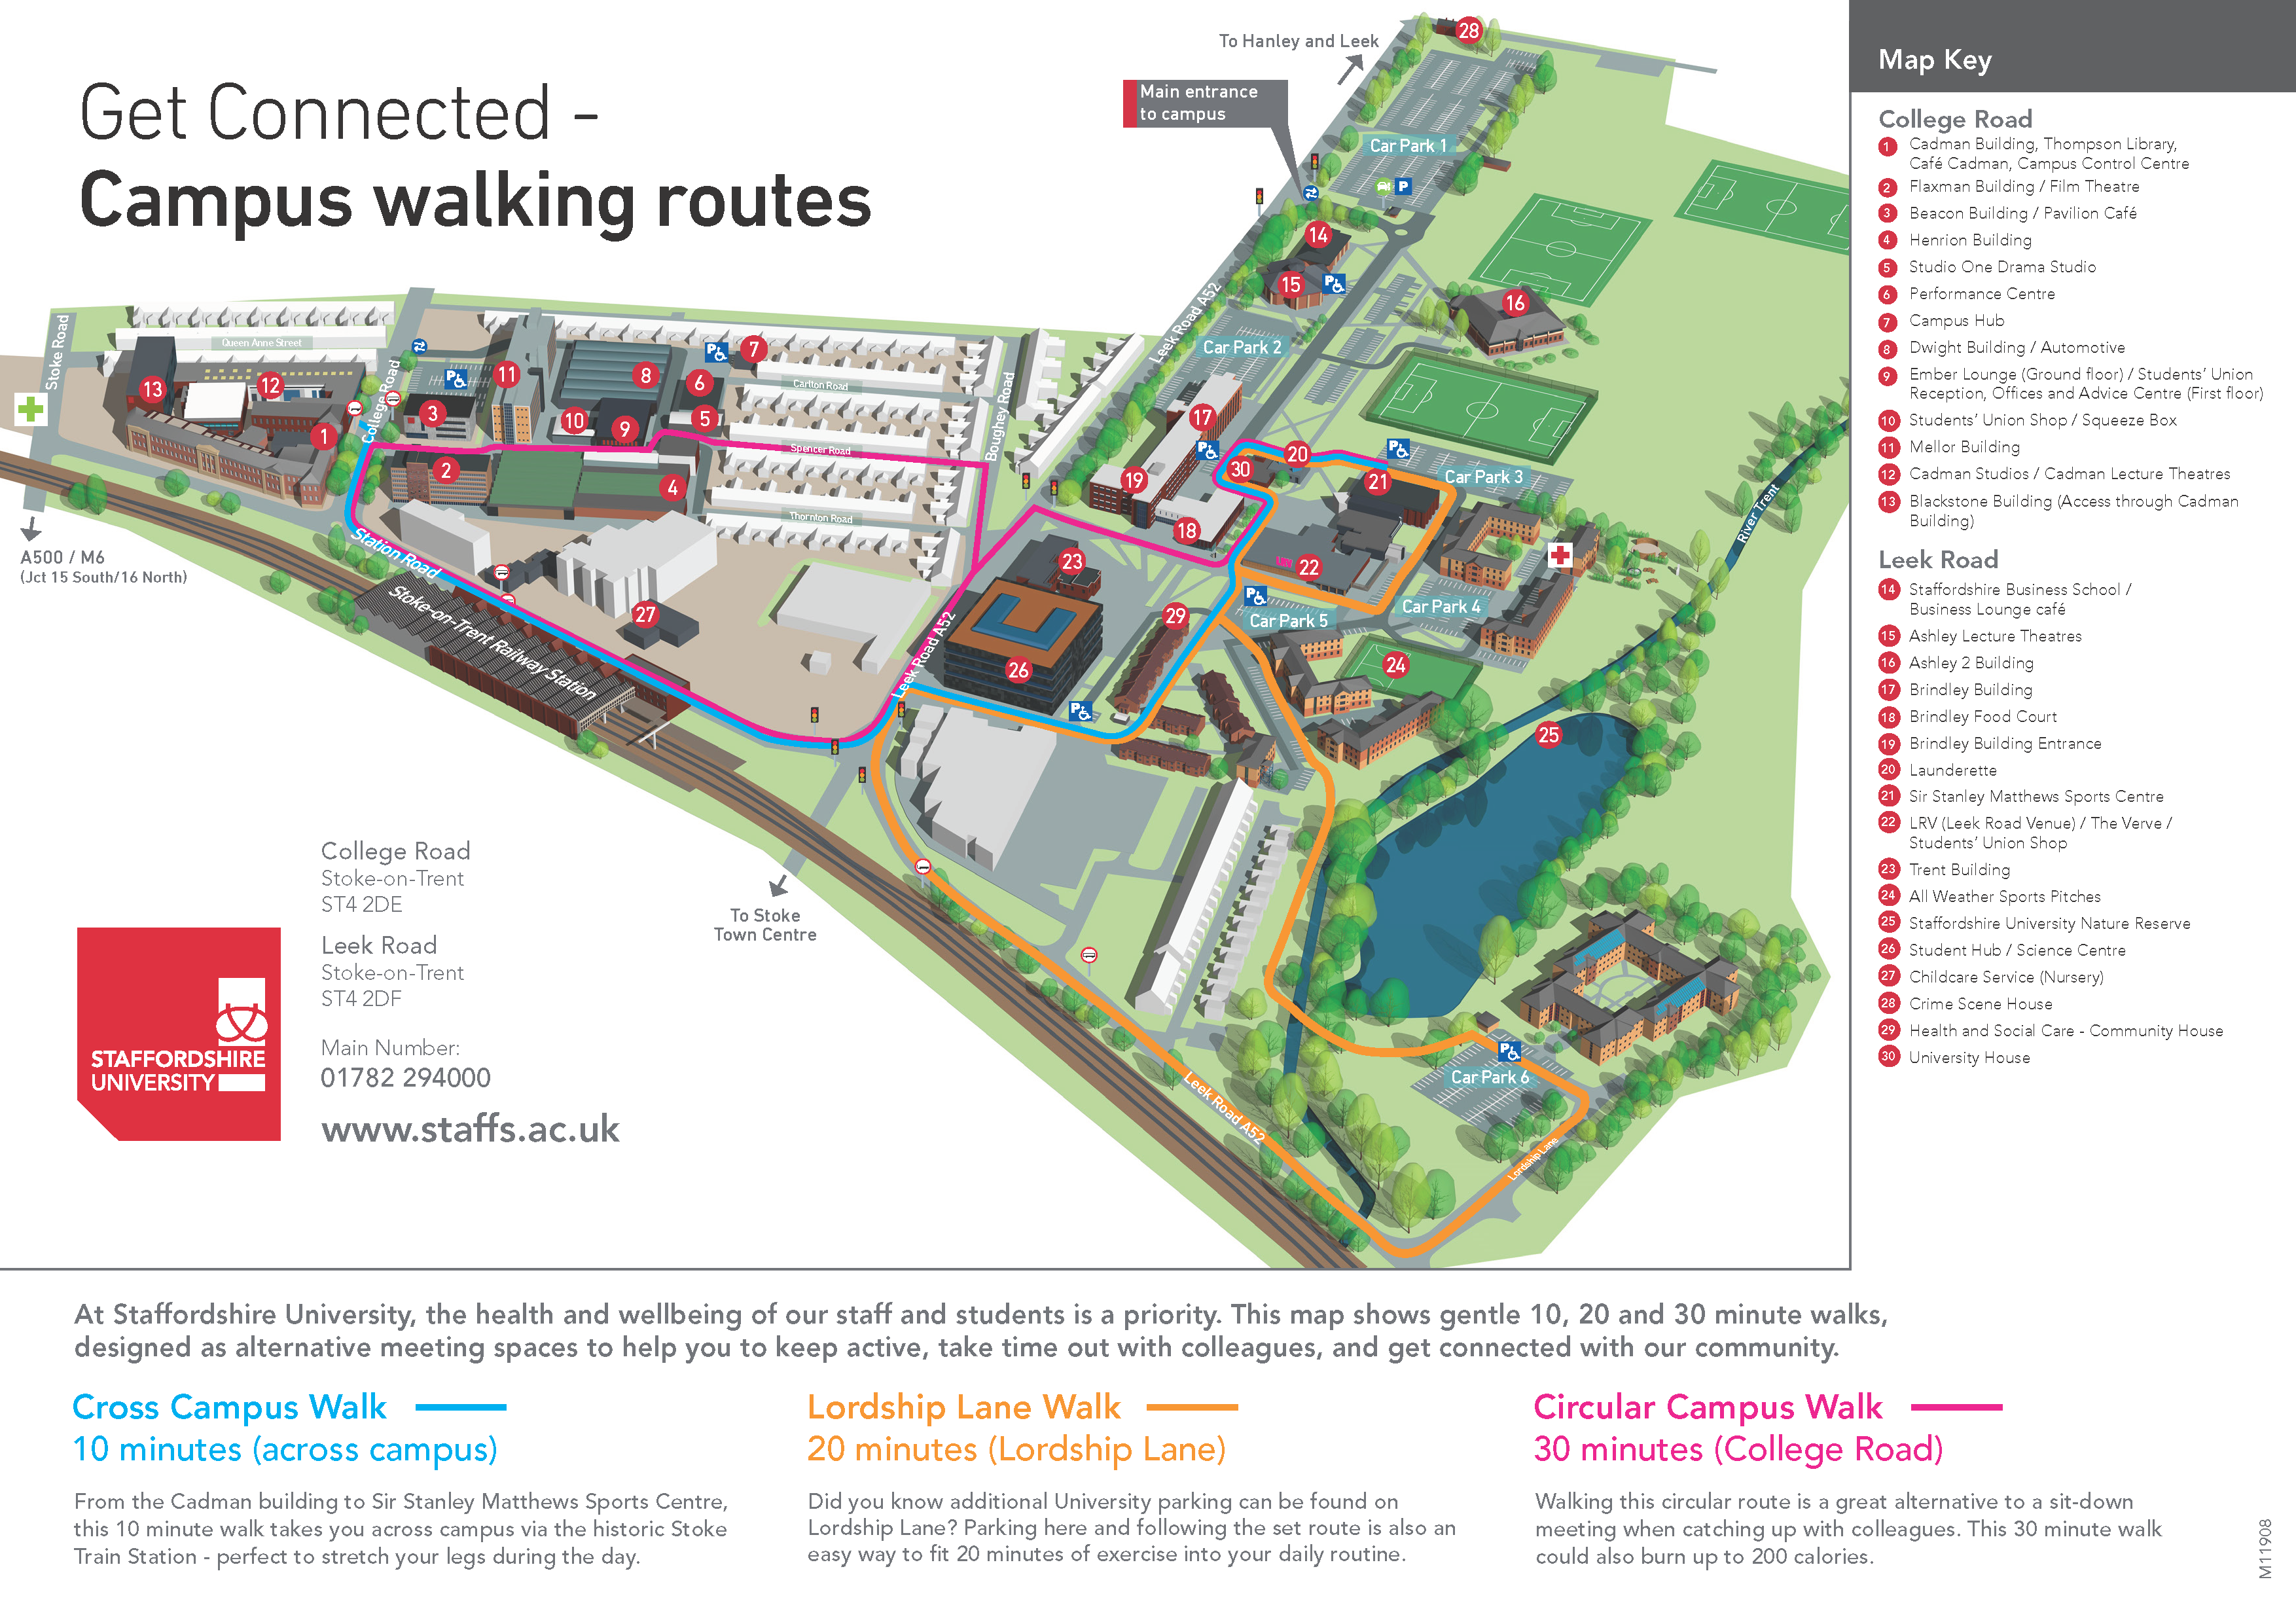 staffordshire university stoke campus map Campus Walking Maps staffordshire university stoke campus map